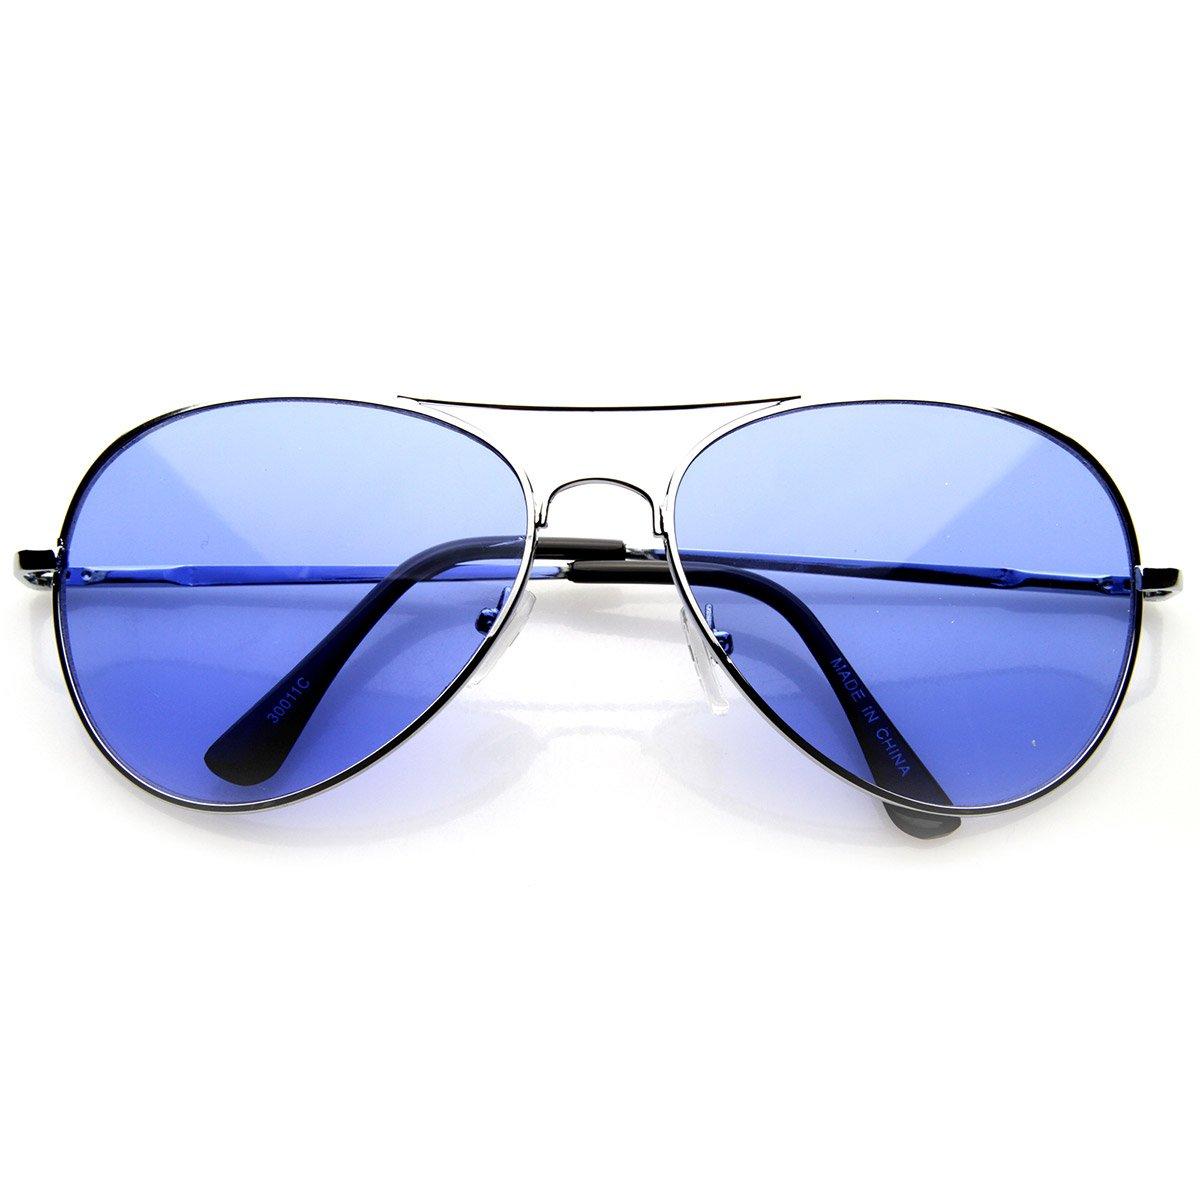 3f1a54784147 Amazon.com  Colorful Premium Silver Metal Aviator Glasses with Color Lens  Sunglasses (Blue)  Shoes